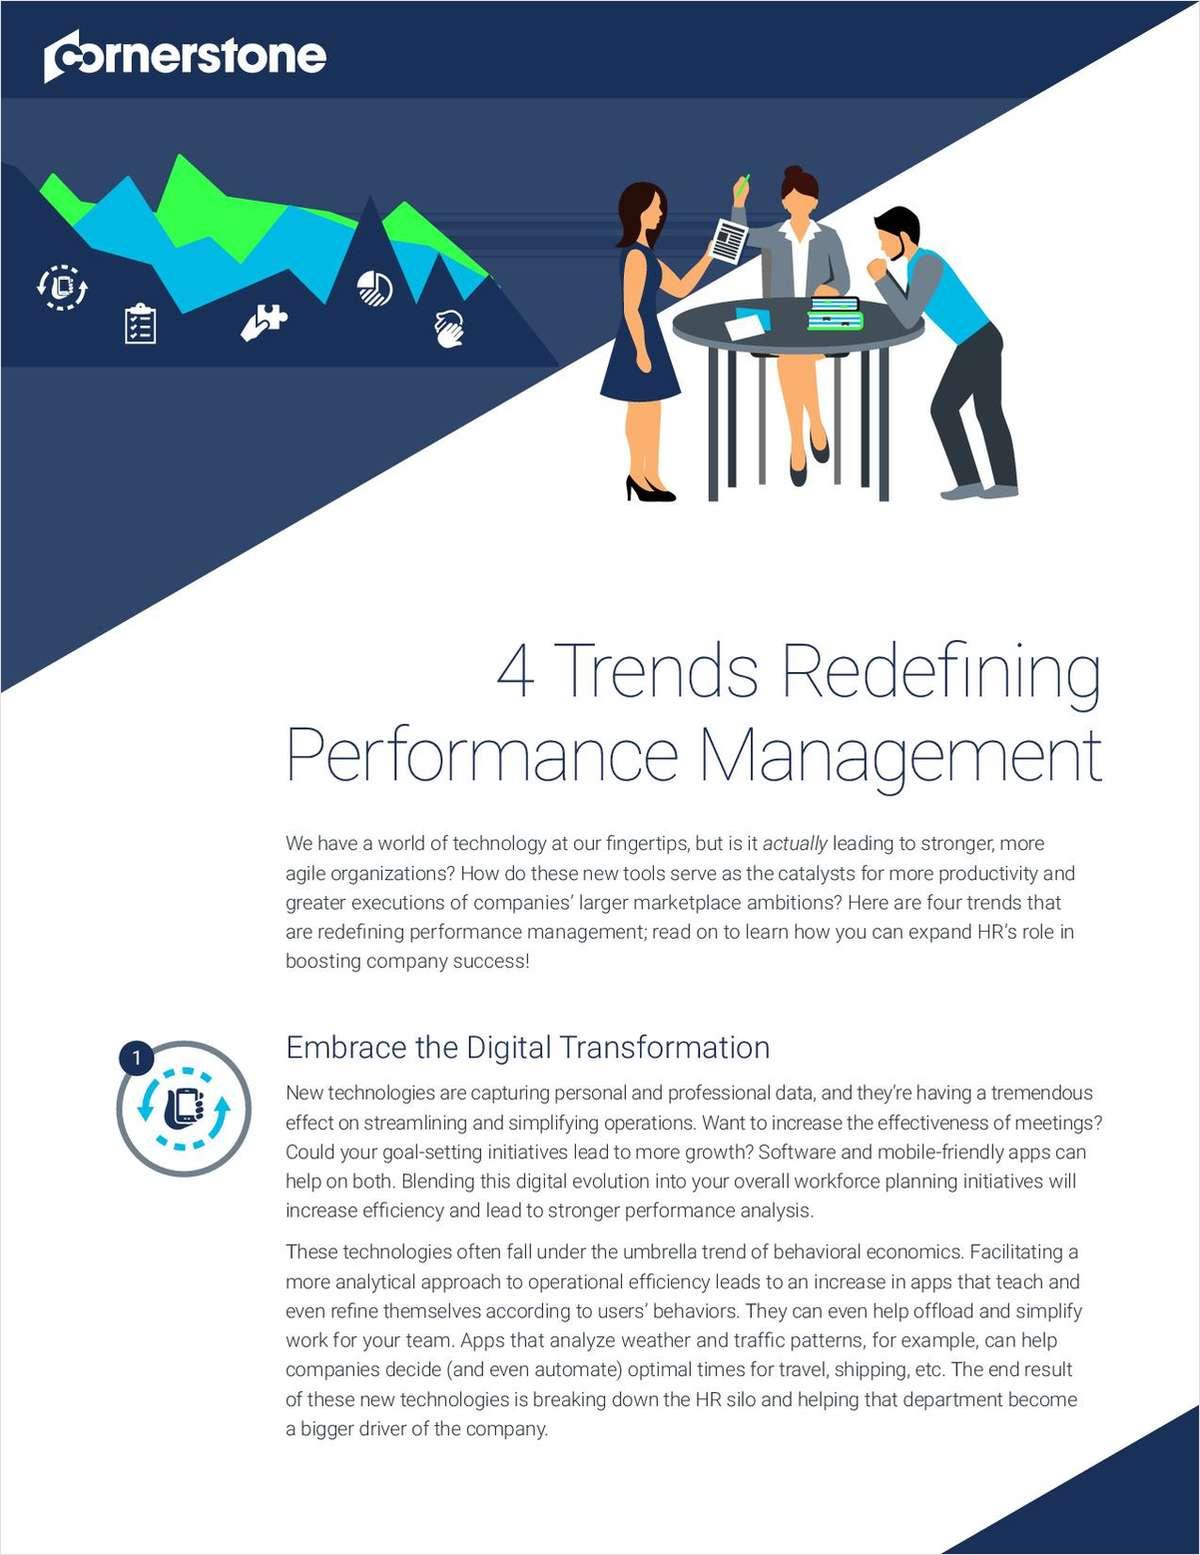 4 Trends Redefining Performance Management